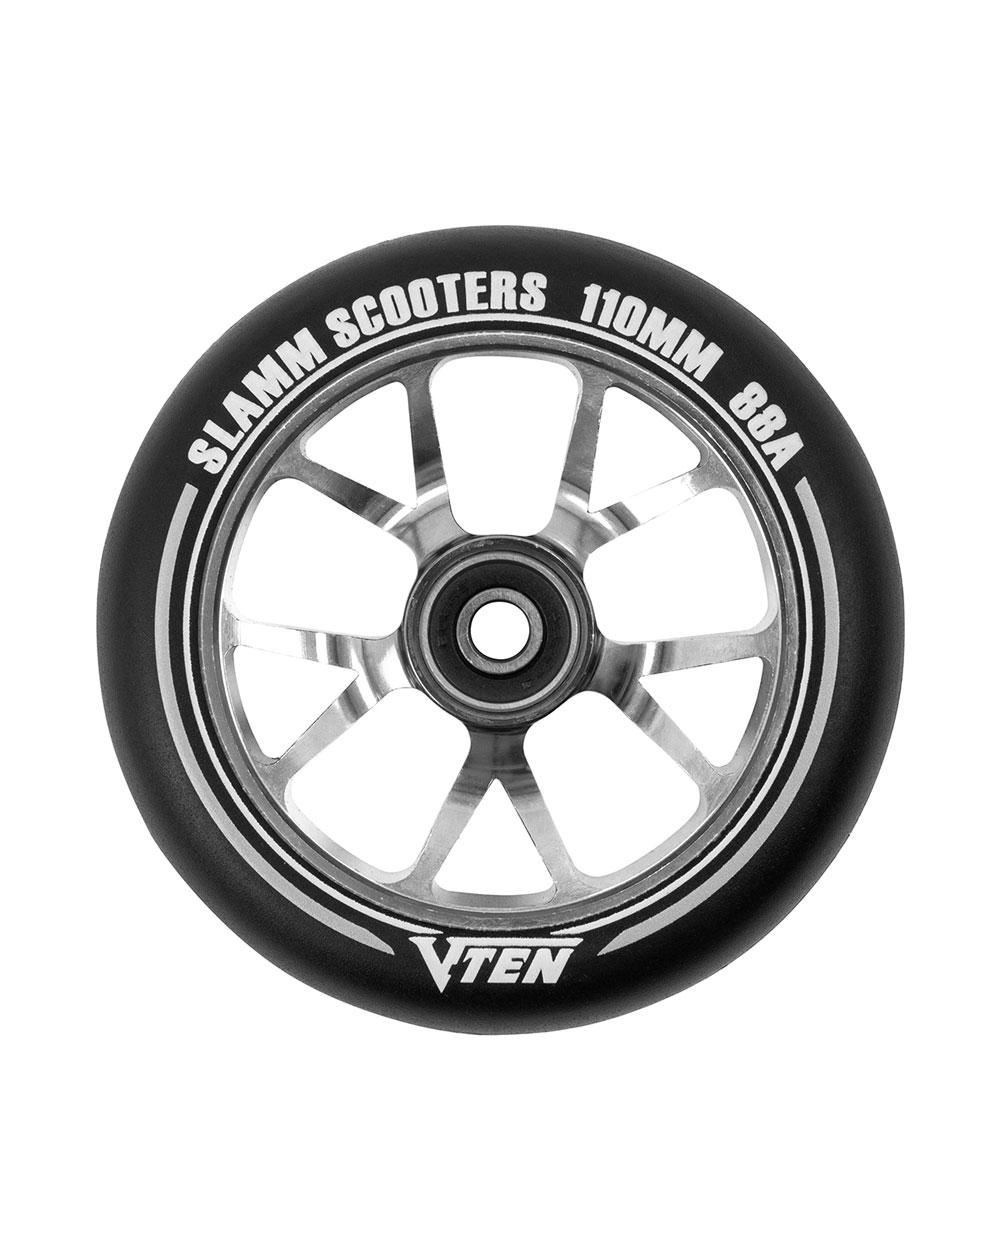 Slamm Scooters V-Ten II 110mm Scooter Wheel Titanium